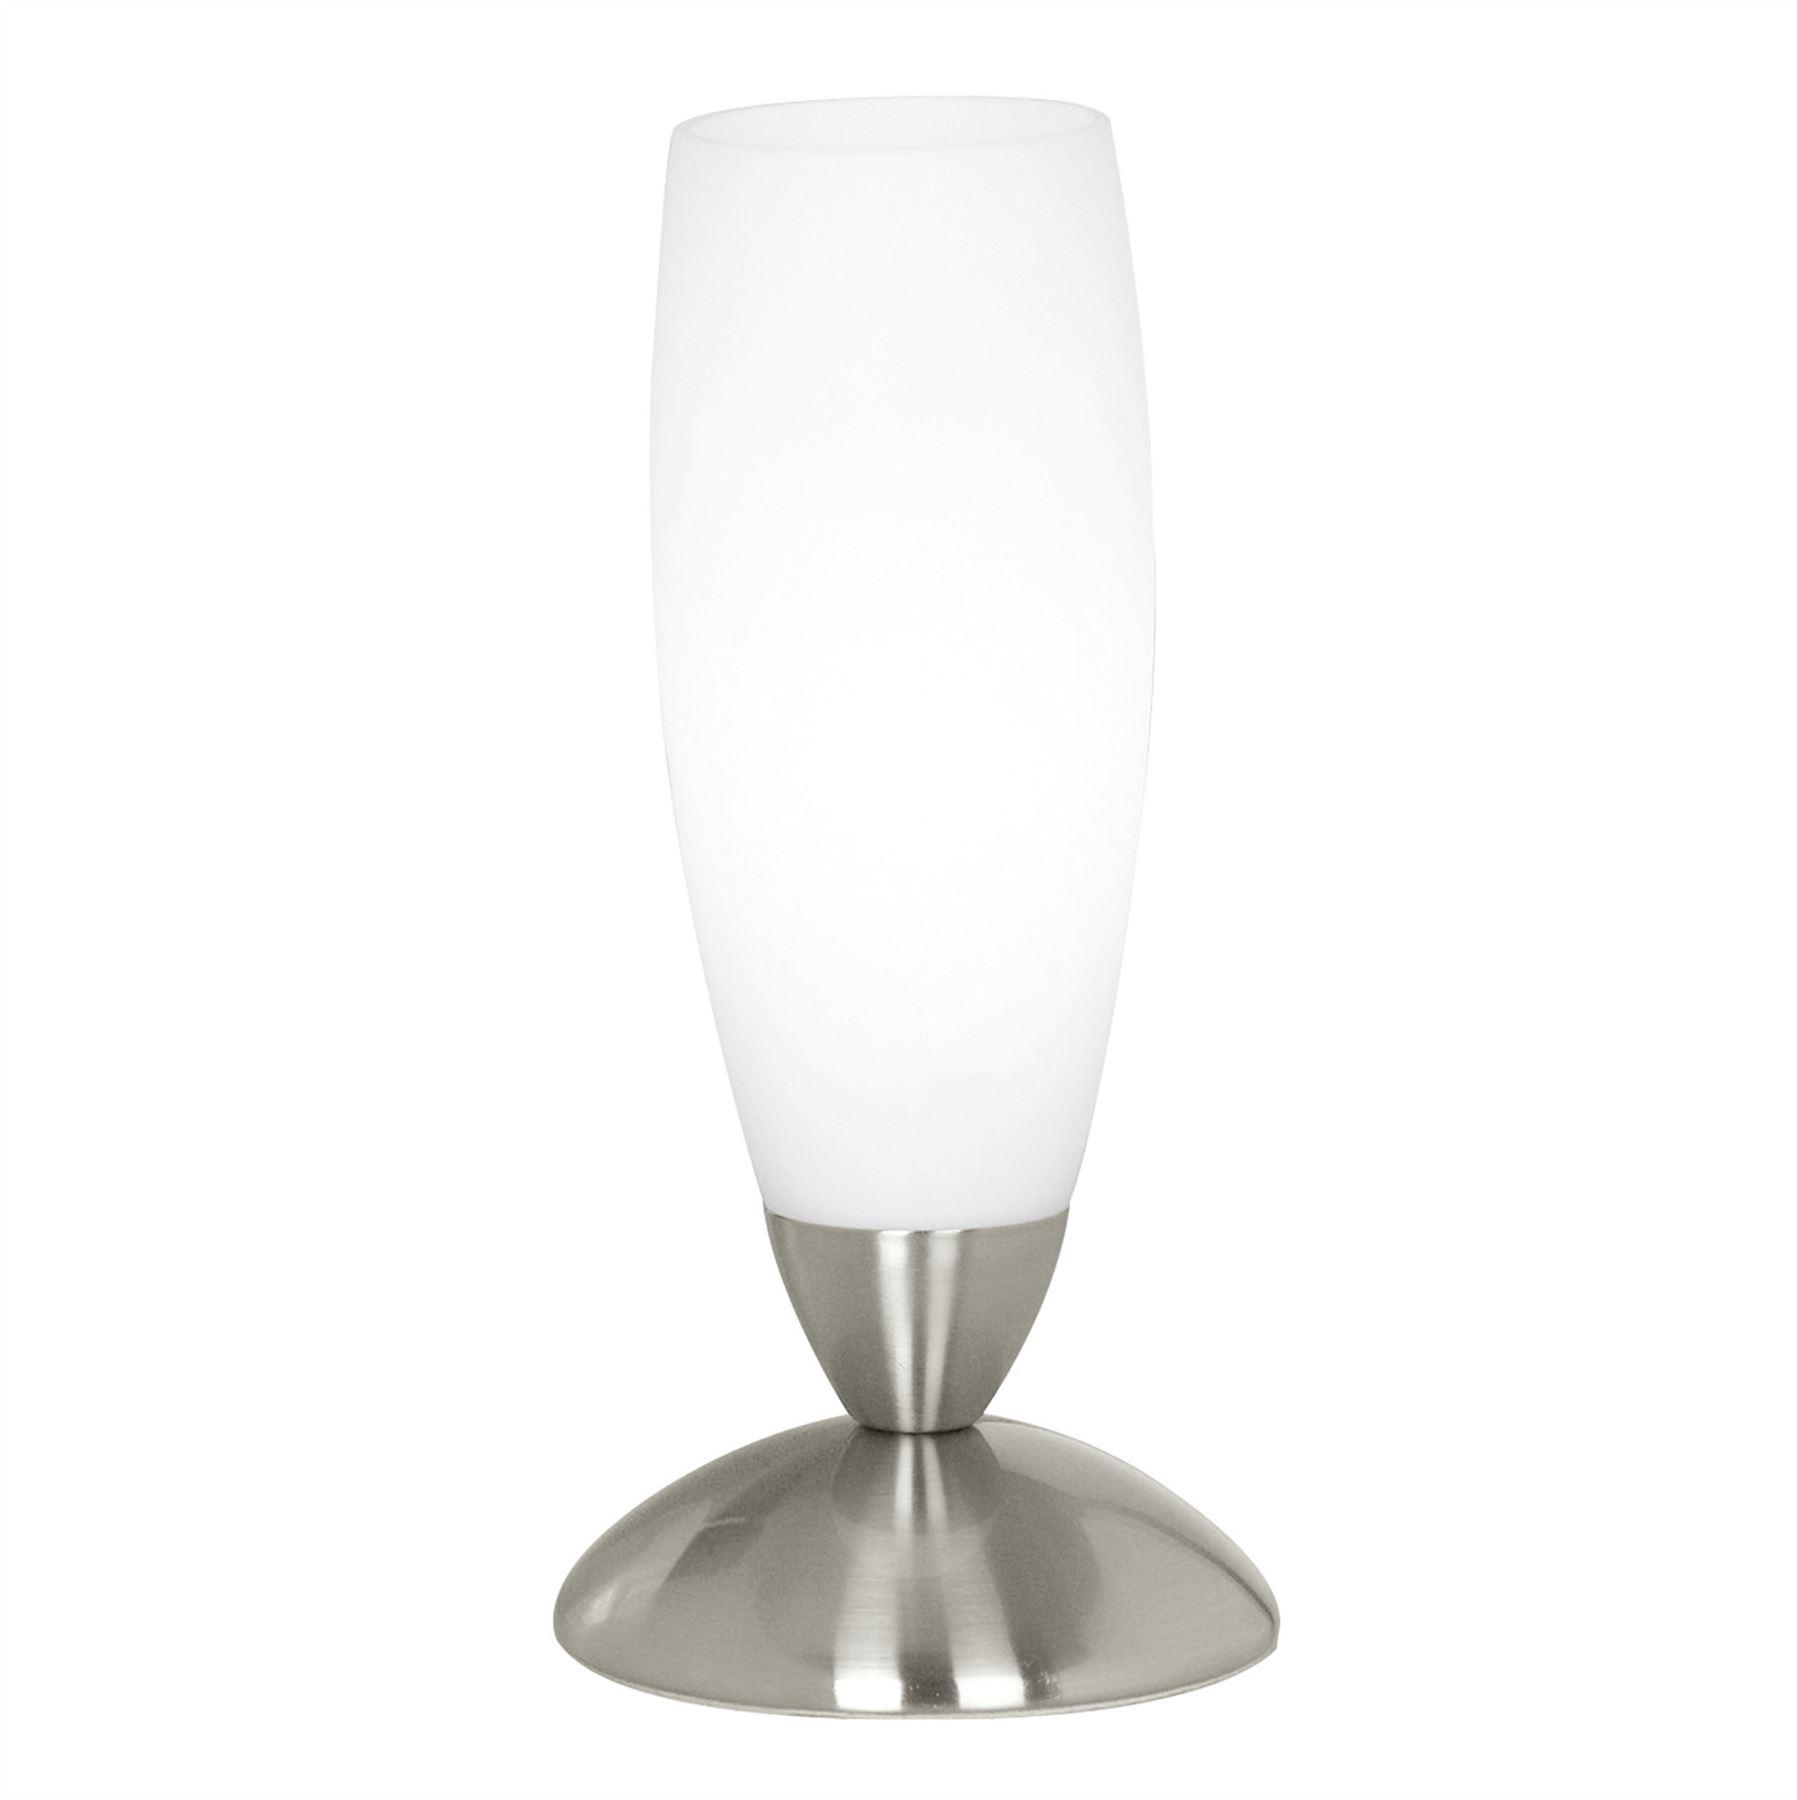 Slim Table Lamp 1 Light Satin Nickel Glass White Shade